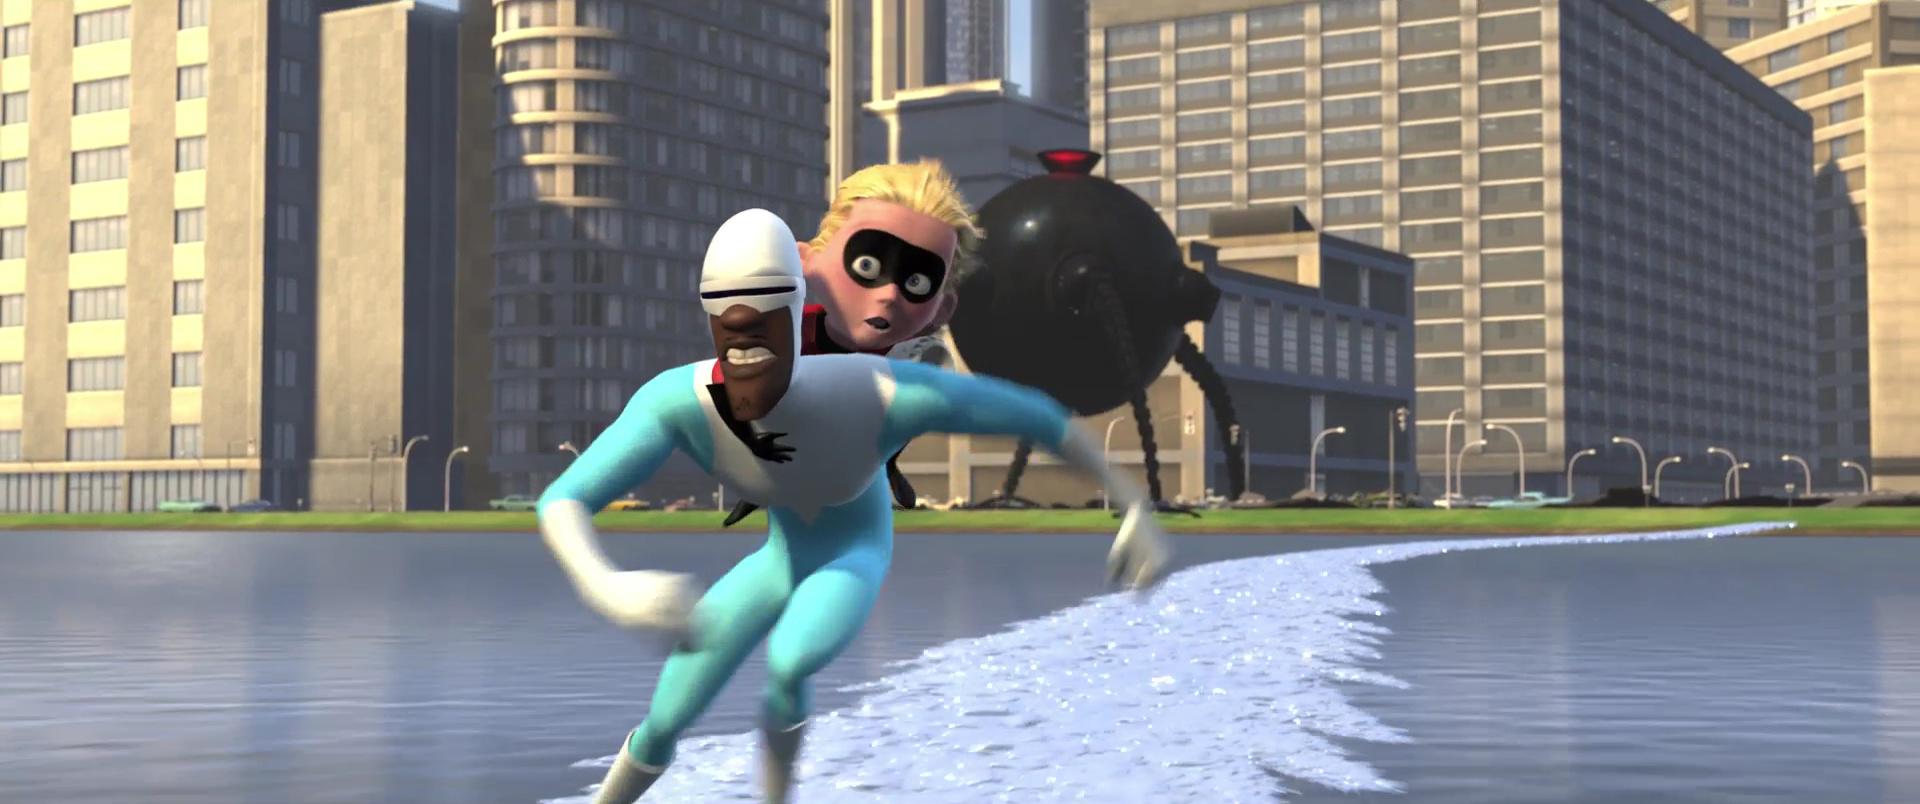 frozone indestructibles incredibles pixar disney